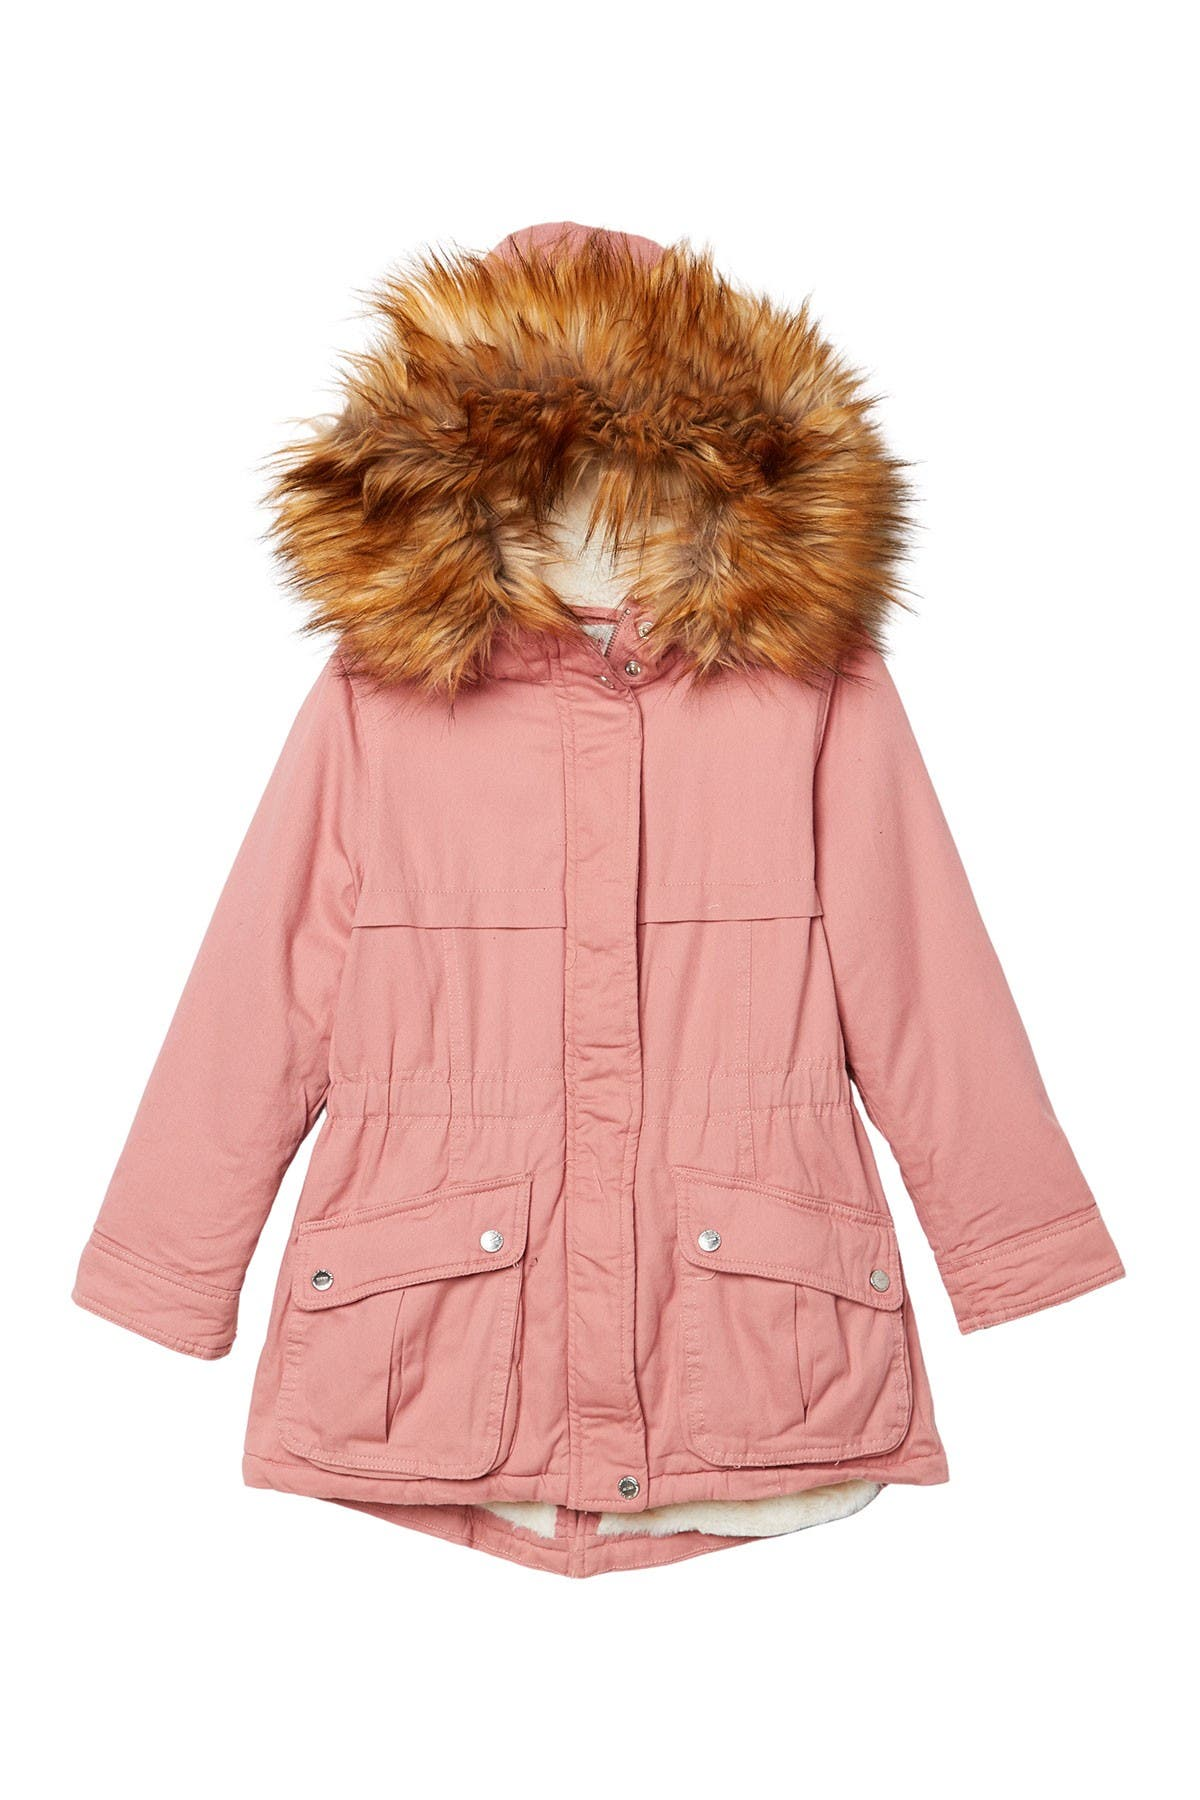 Large Urban Republic Boys Twill Faux Sherpa Lined Hooded Jacket